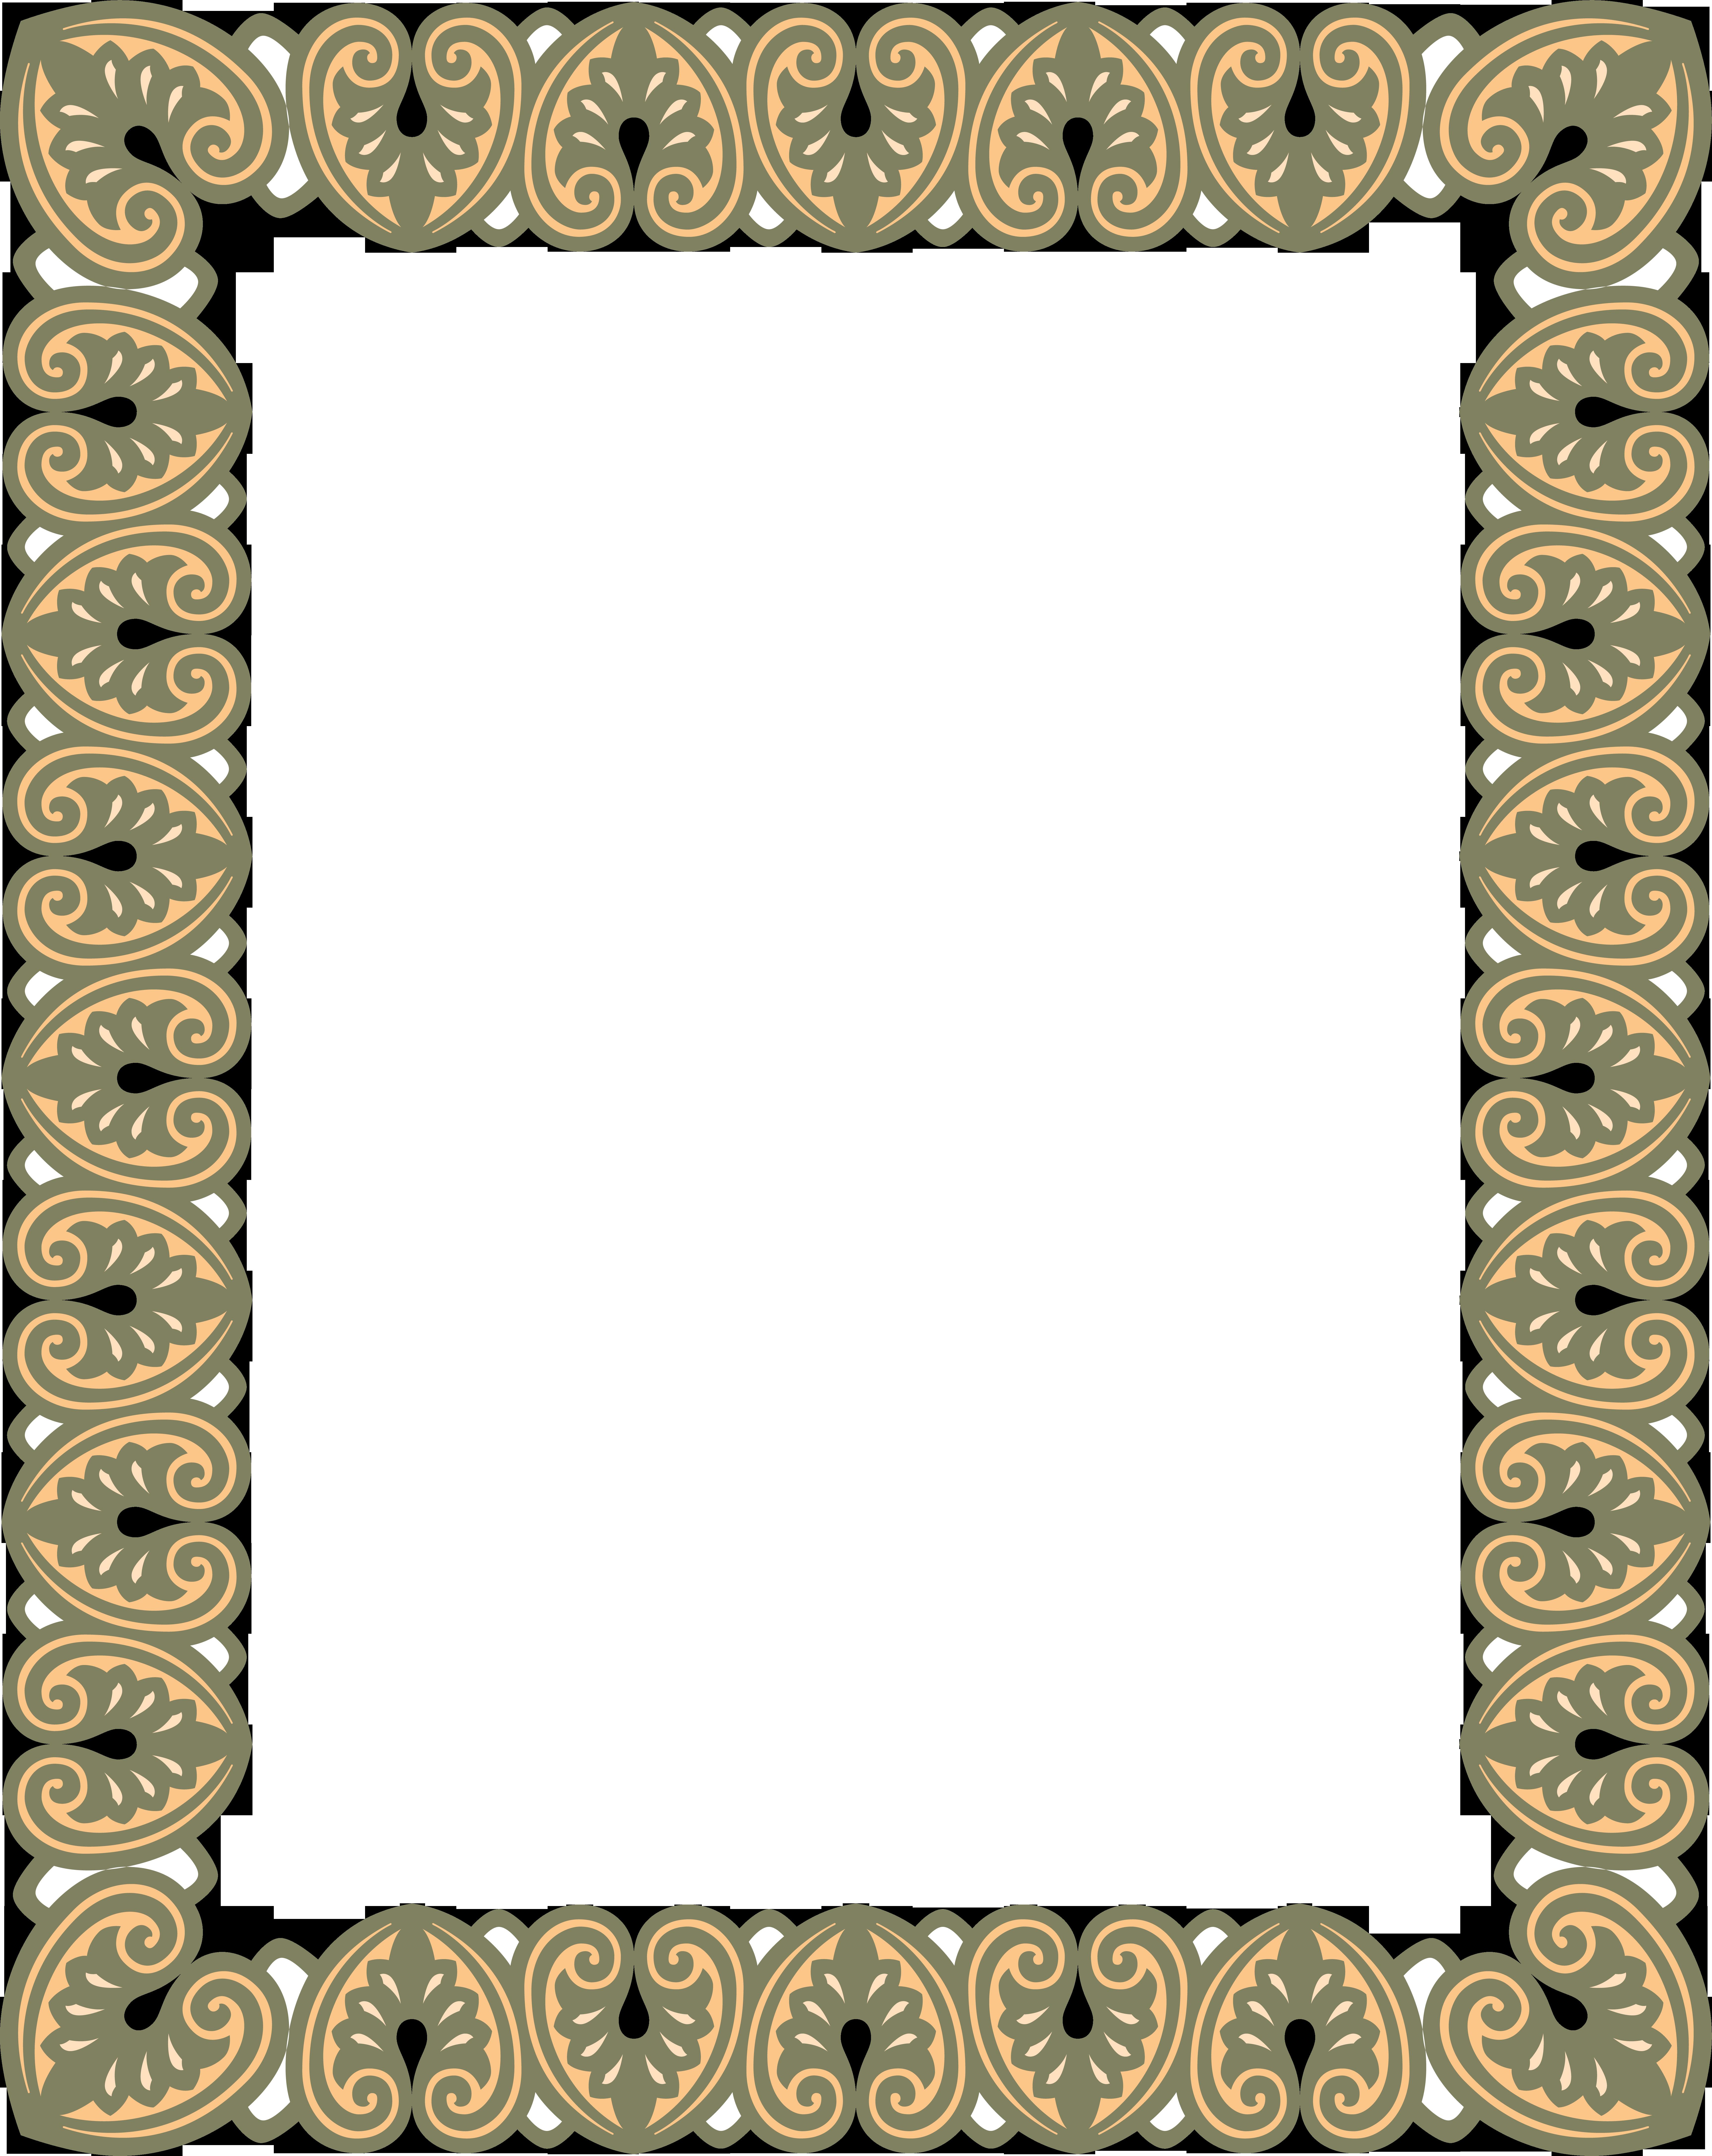 Рамки казахского орнамента в word